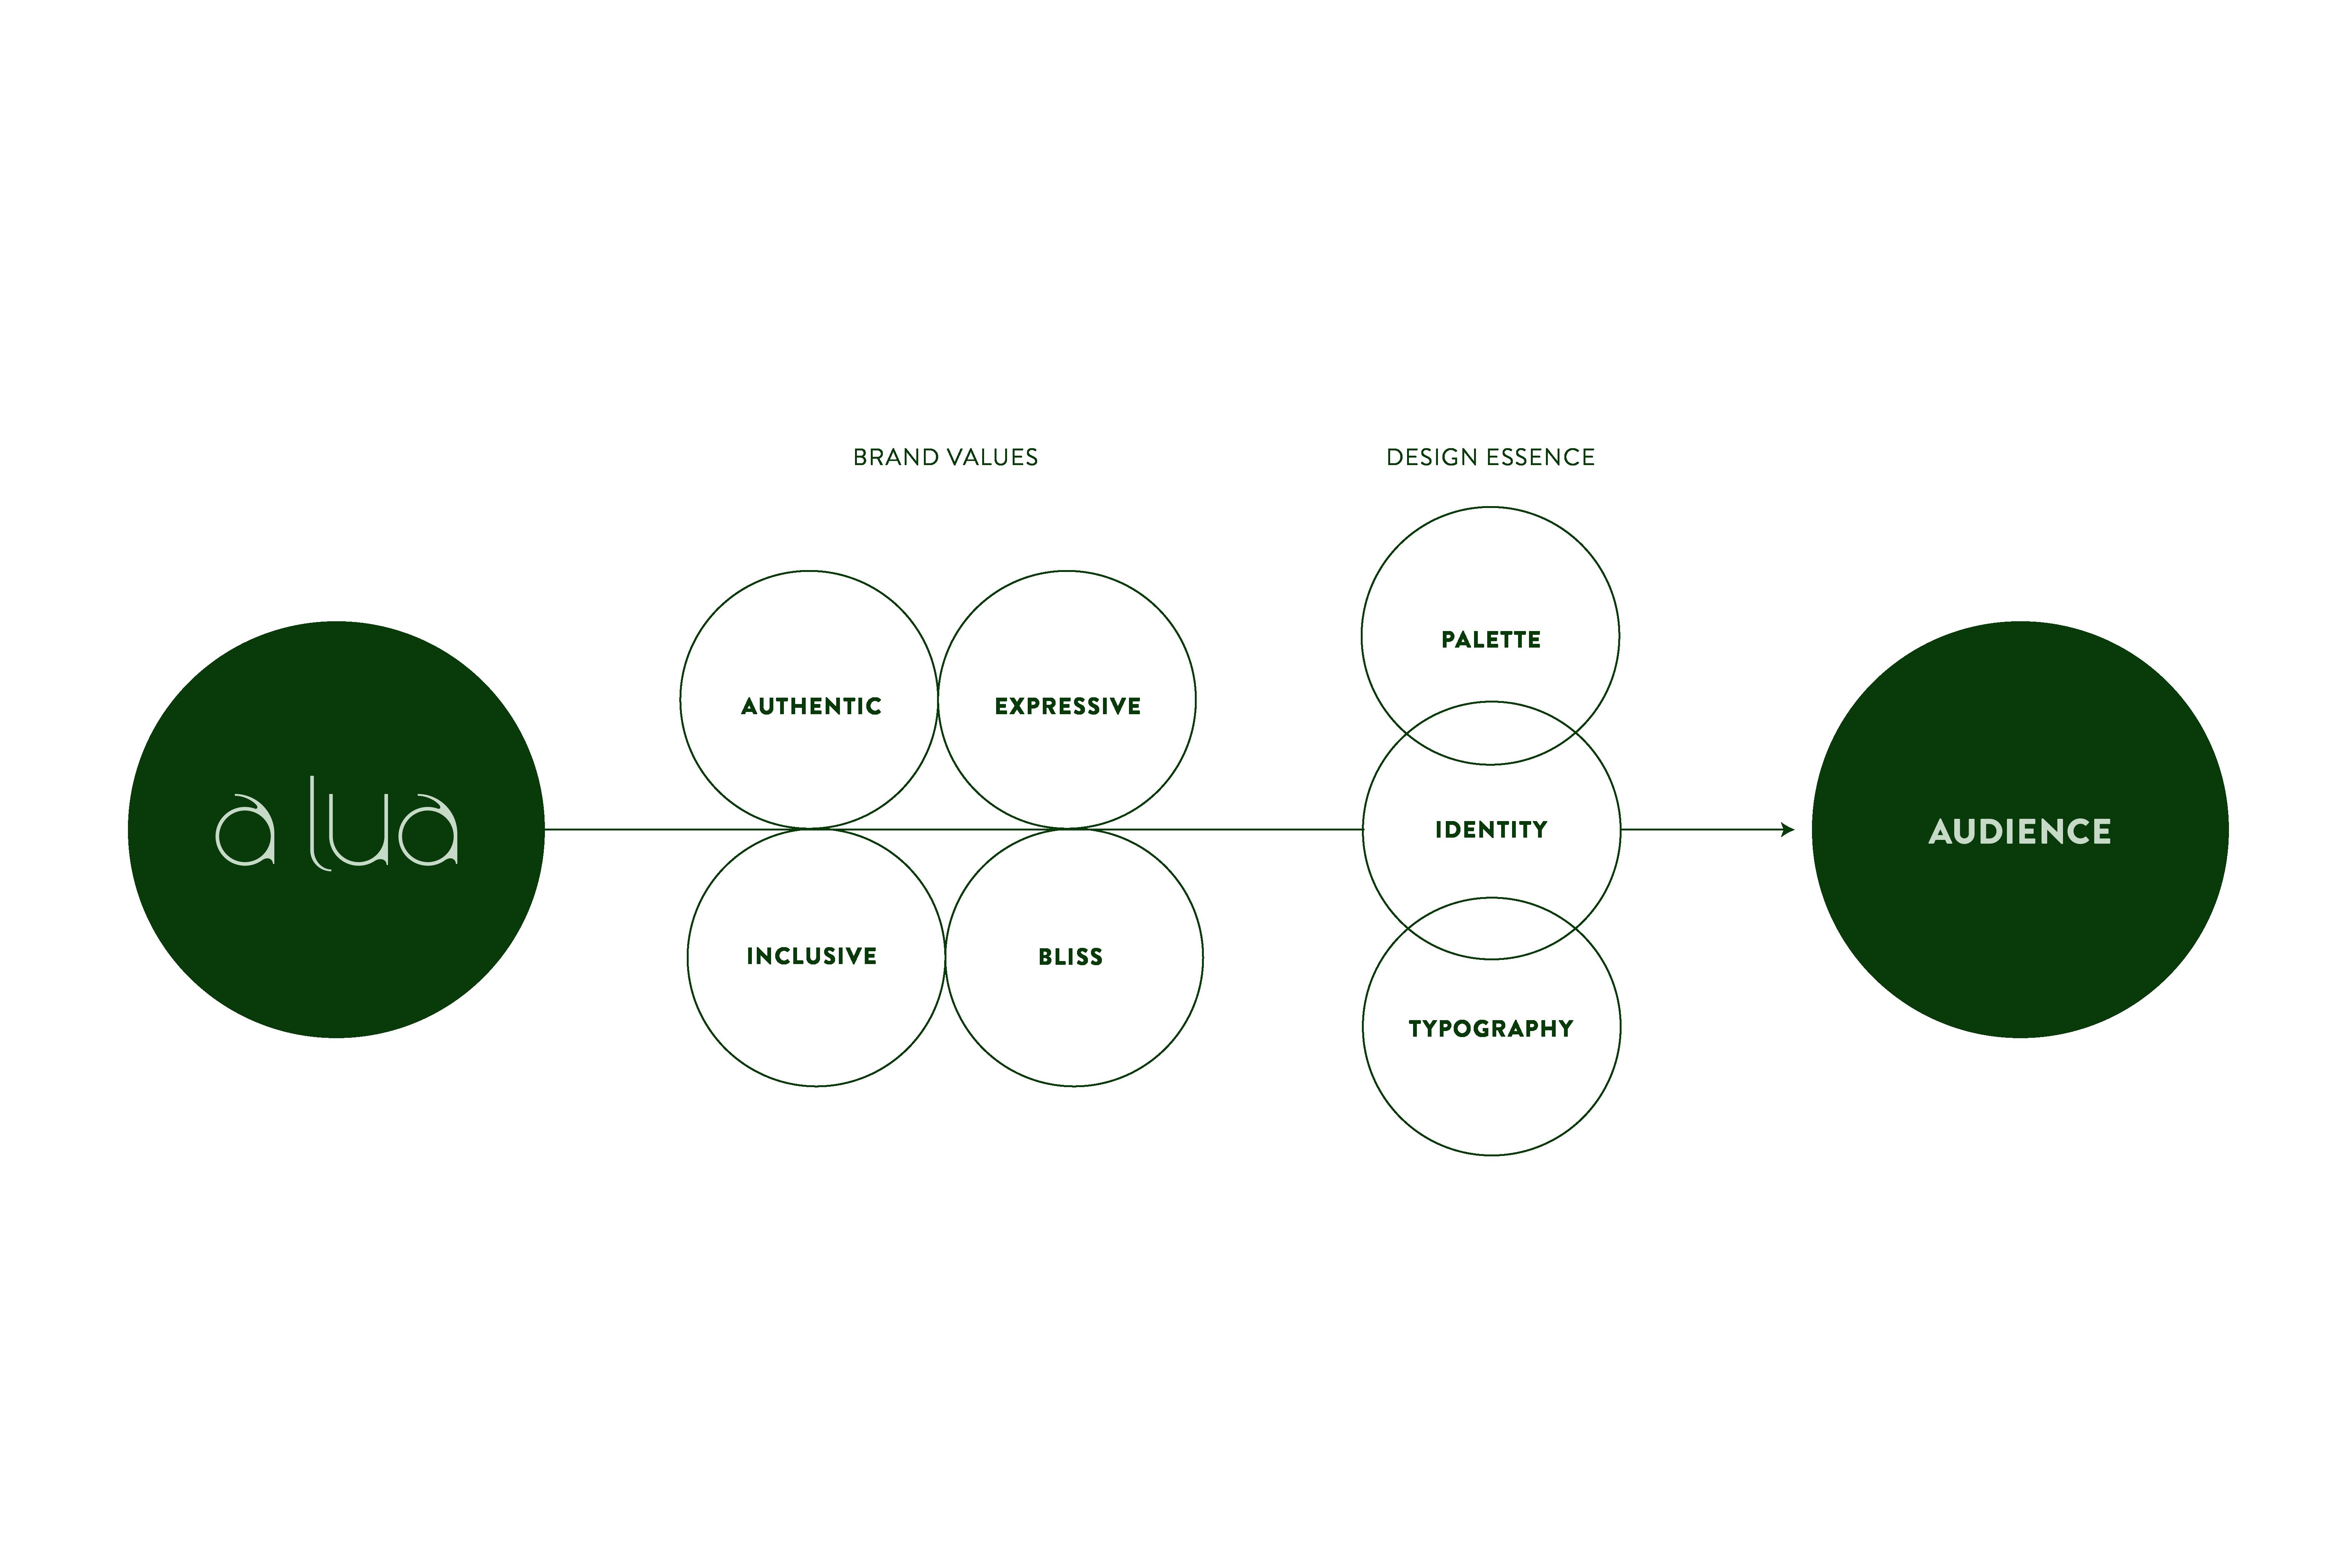 A Lua brand strategy